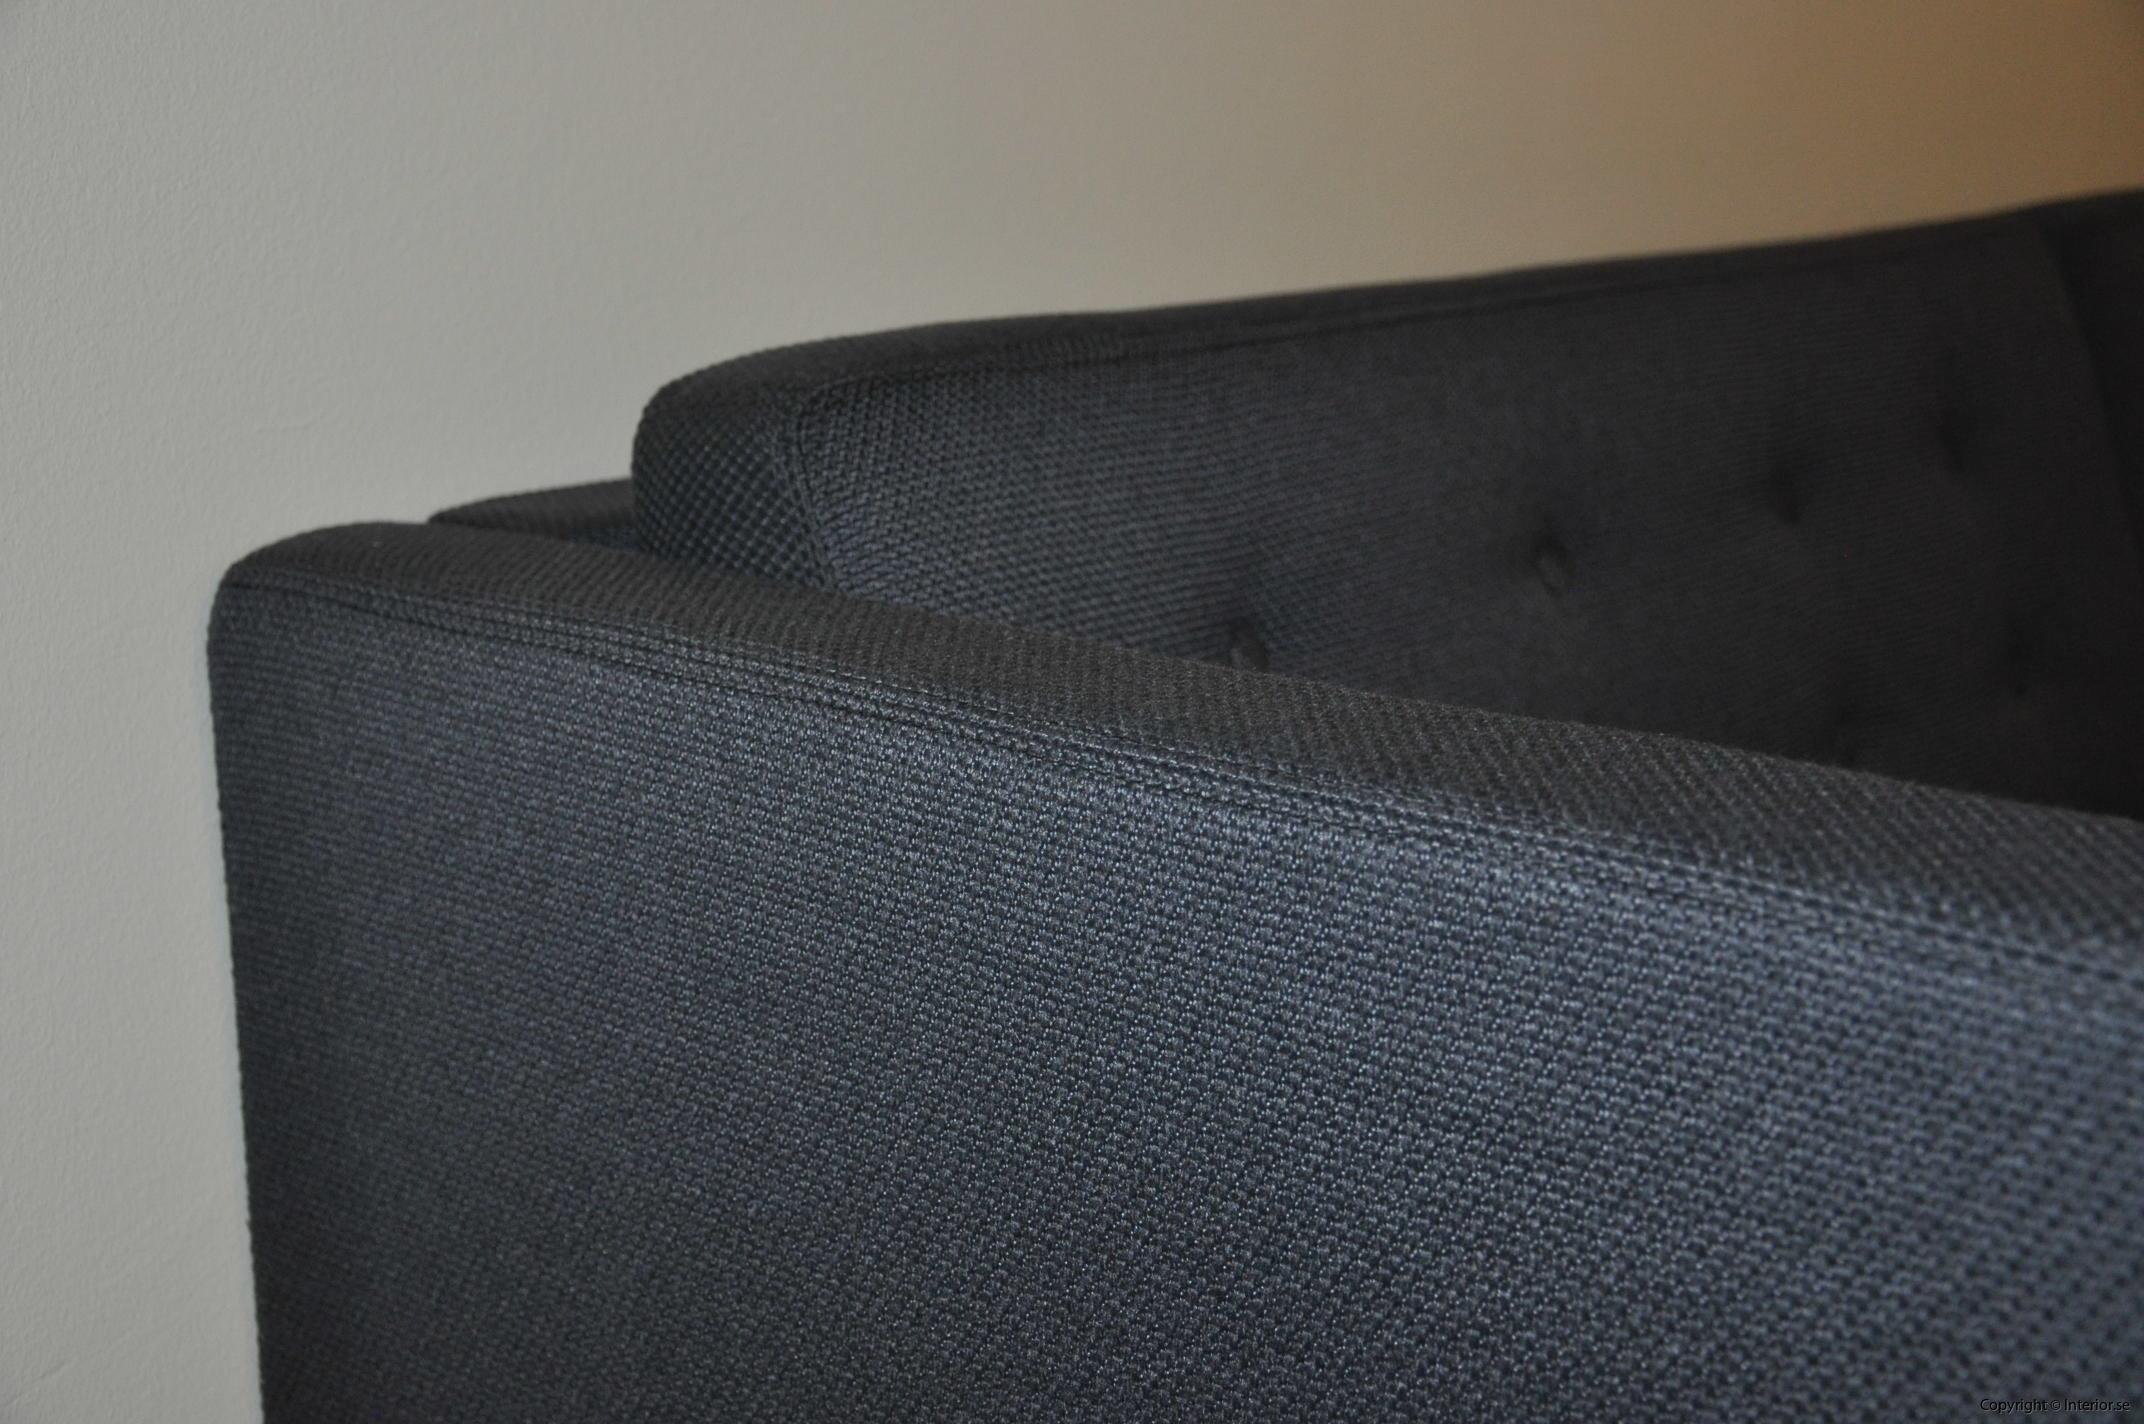 Begagnade designmöbler Swedese Madisson 3 sitssoffa (9)